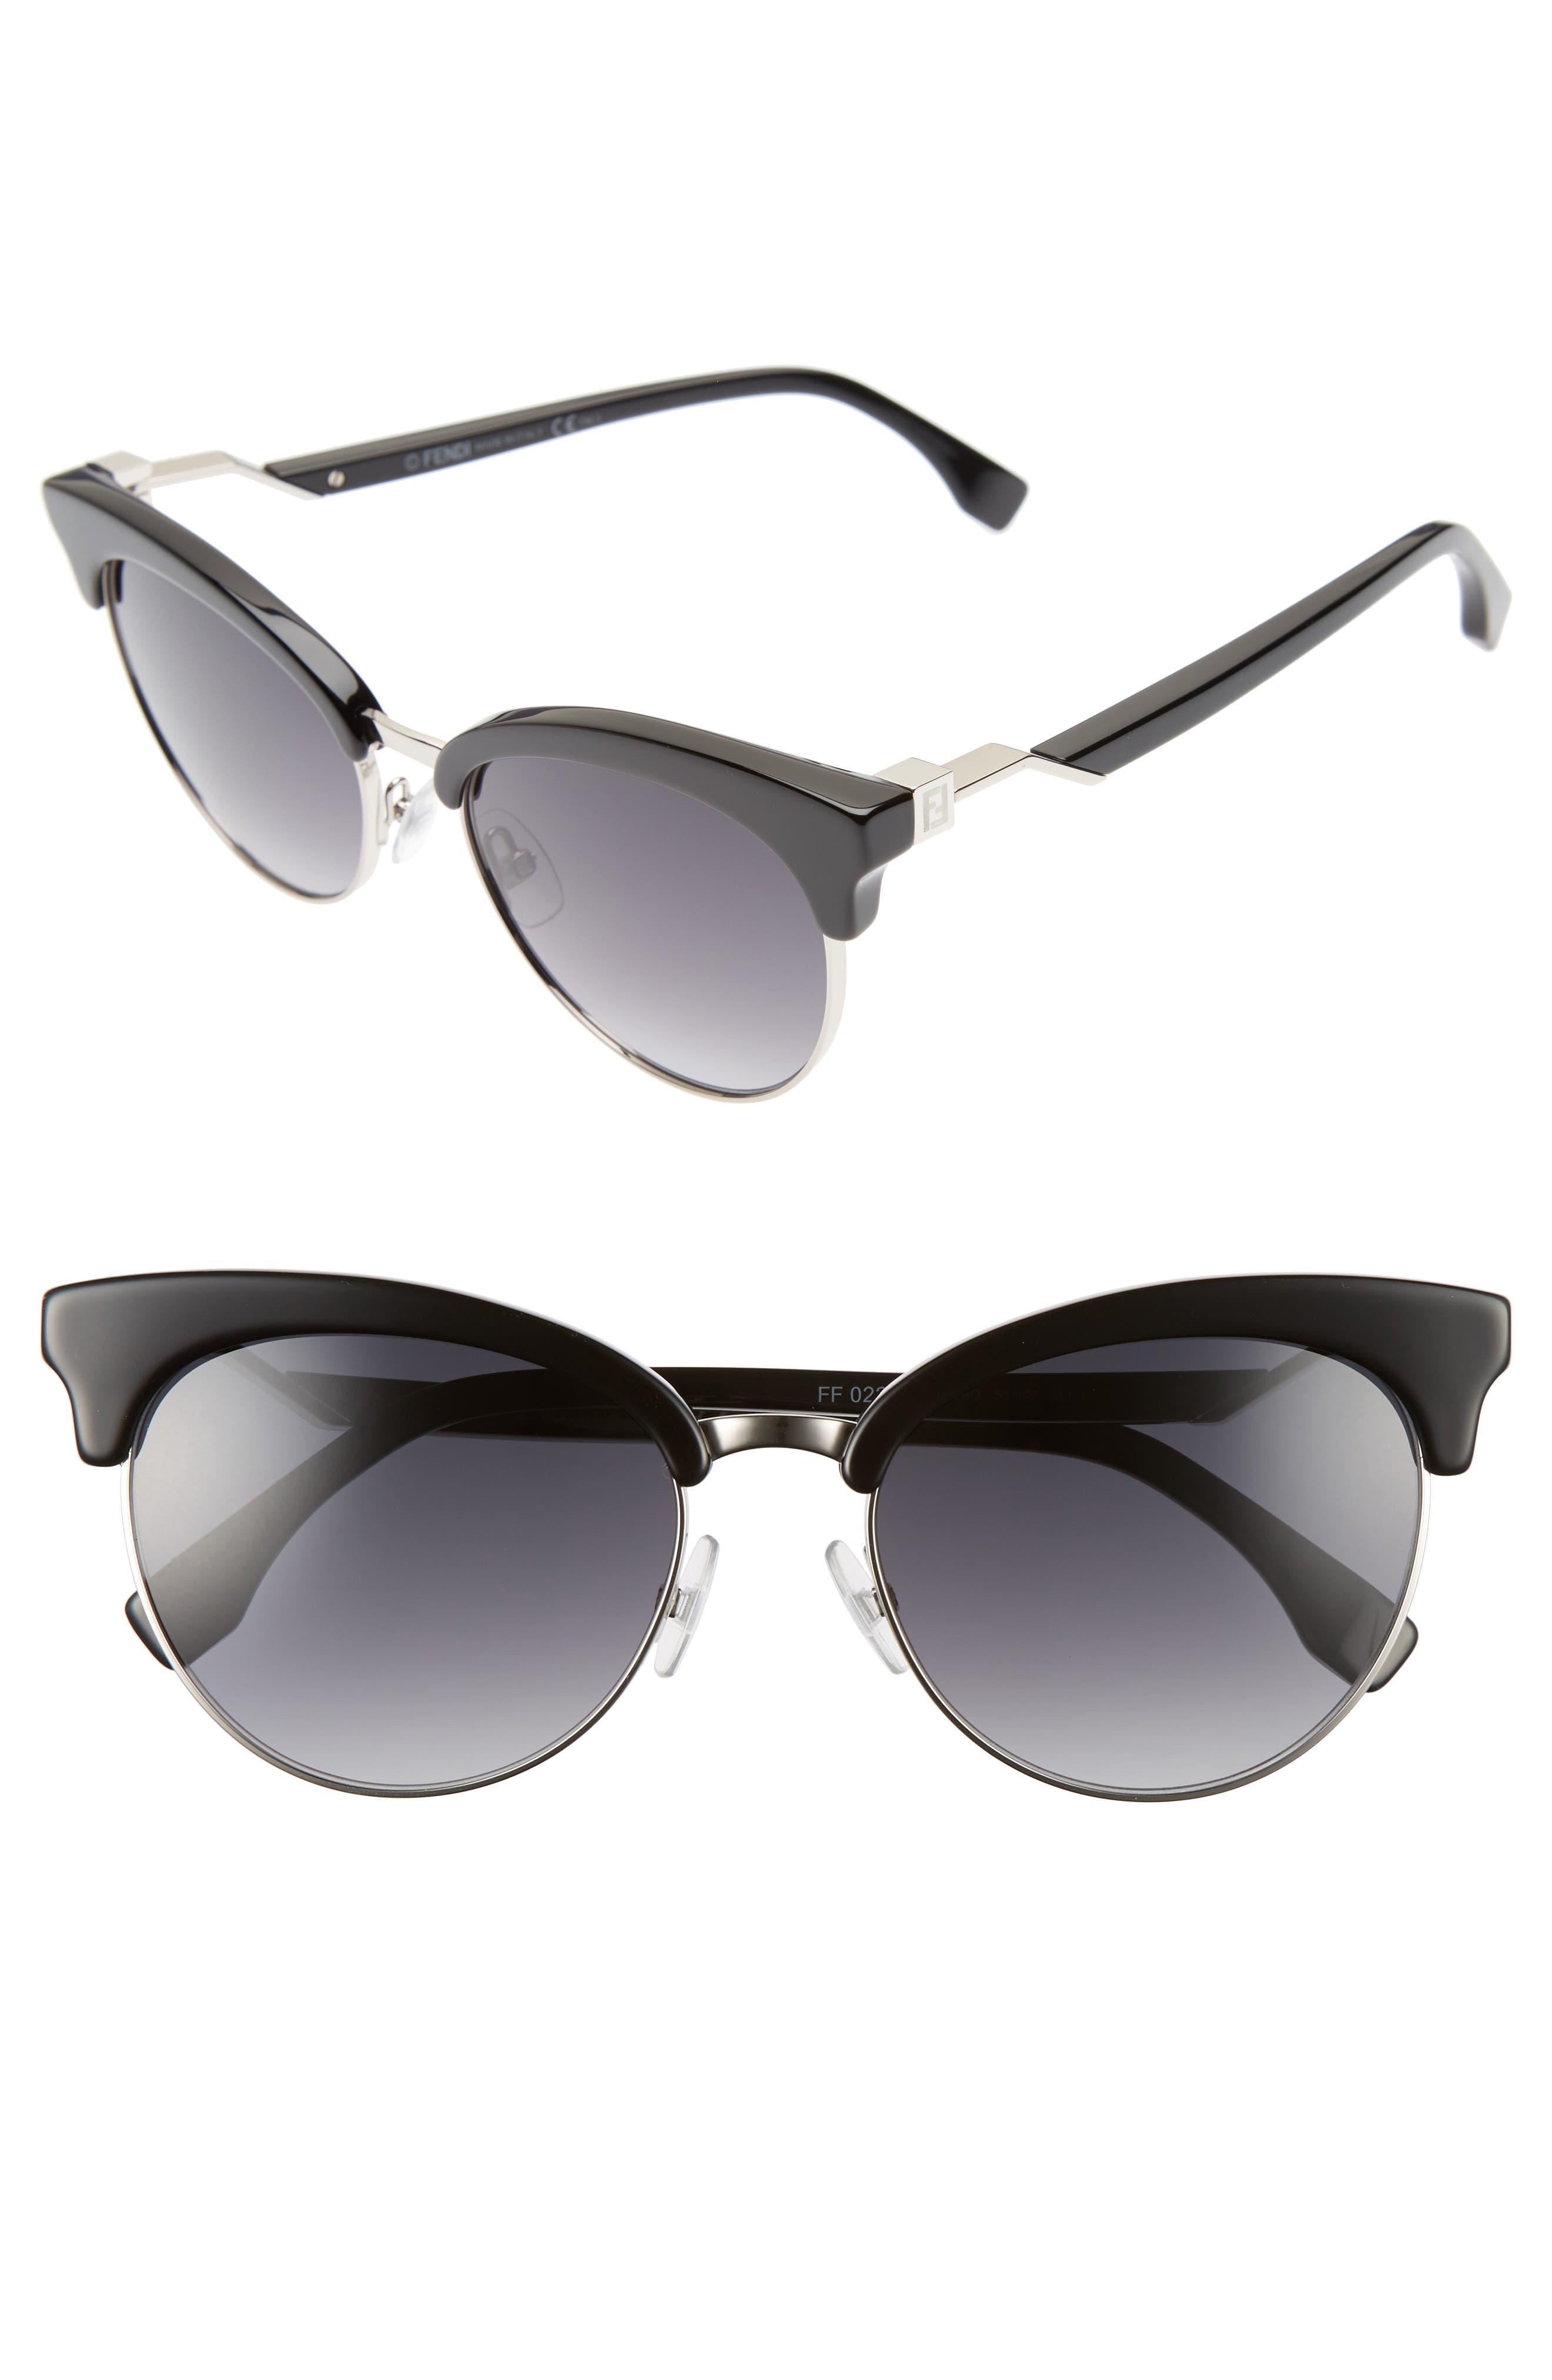 55mm Gradient Lens Cat Eye Sunglasses,                             Main thumbnail 1, color,                             001